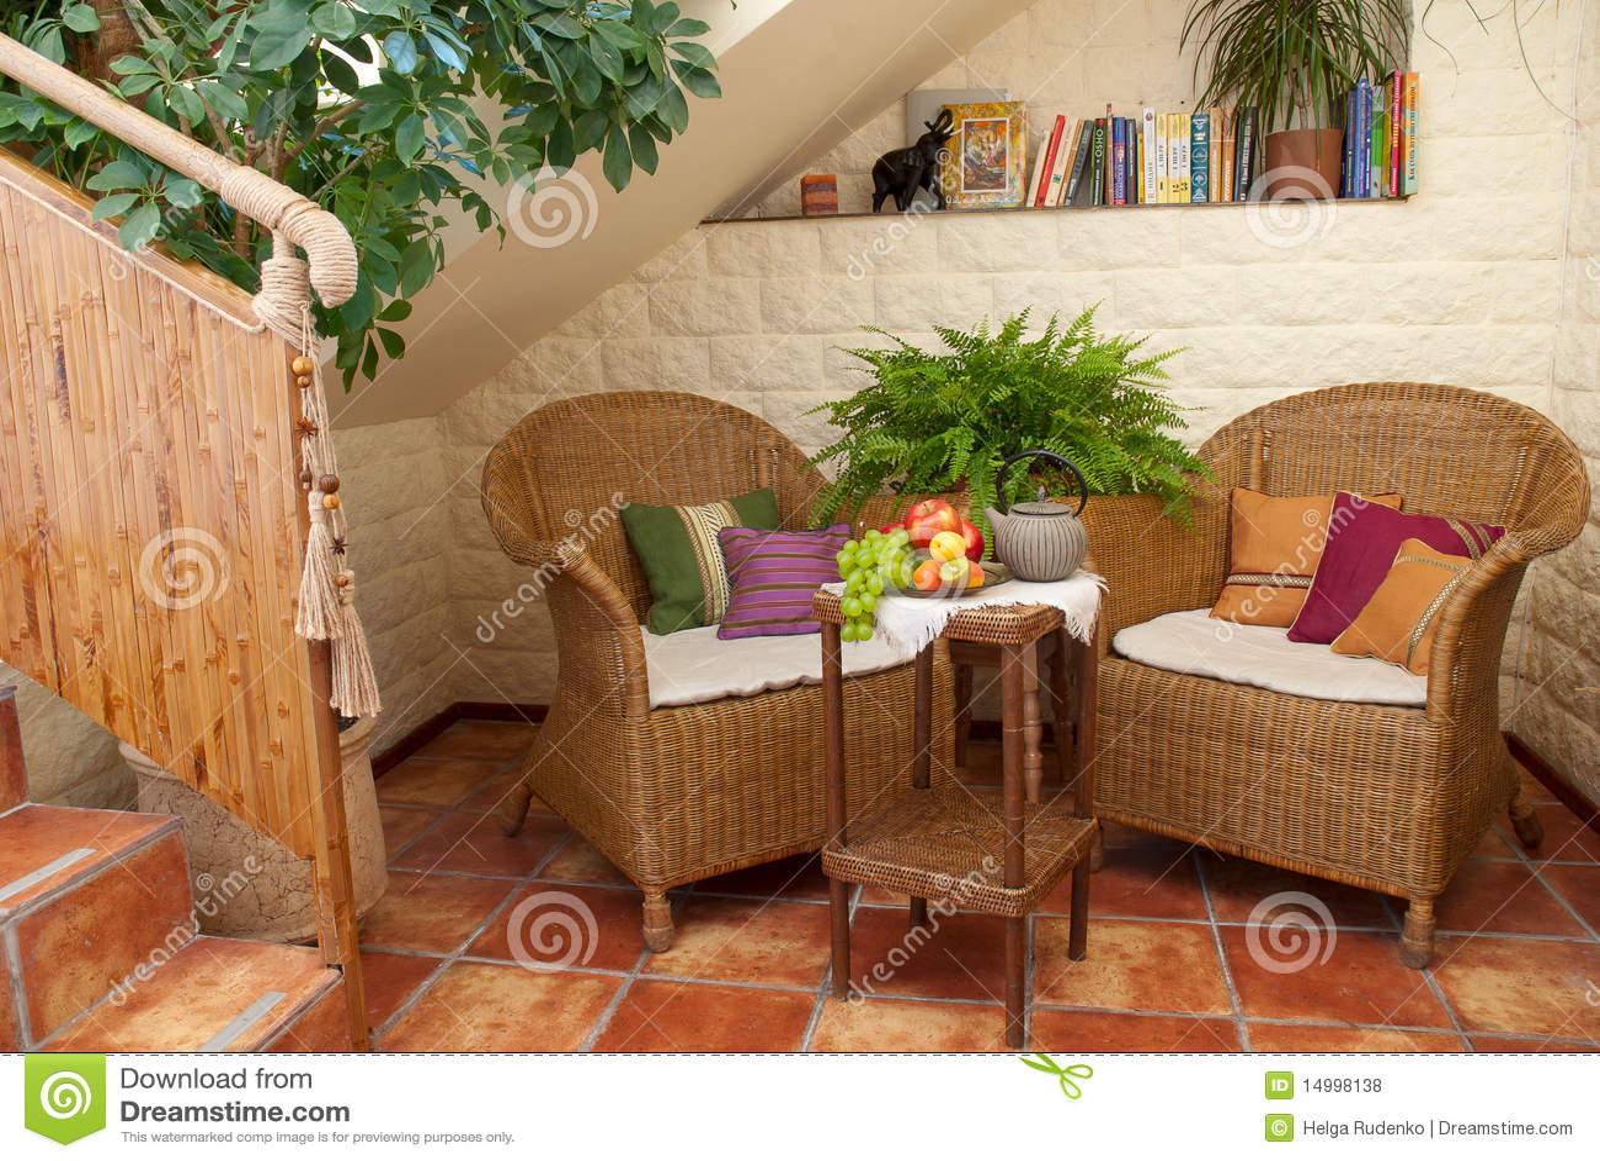 Muebles De Mimbre En Valencia Finest Muebles De Mimbre With  # Muebles Junco Santo Domingo